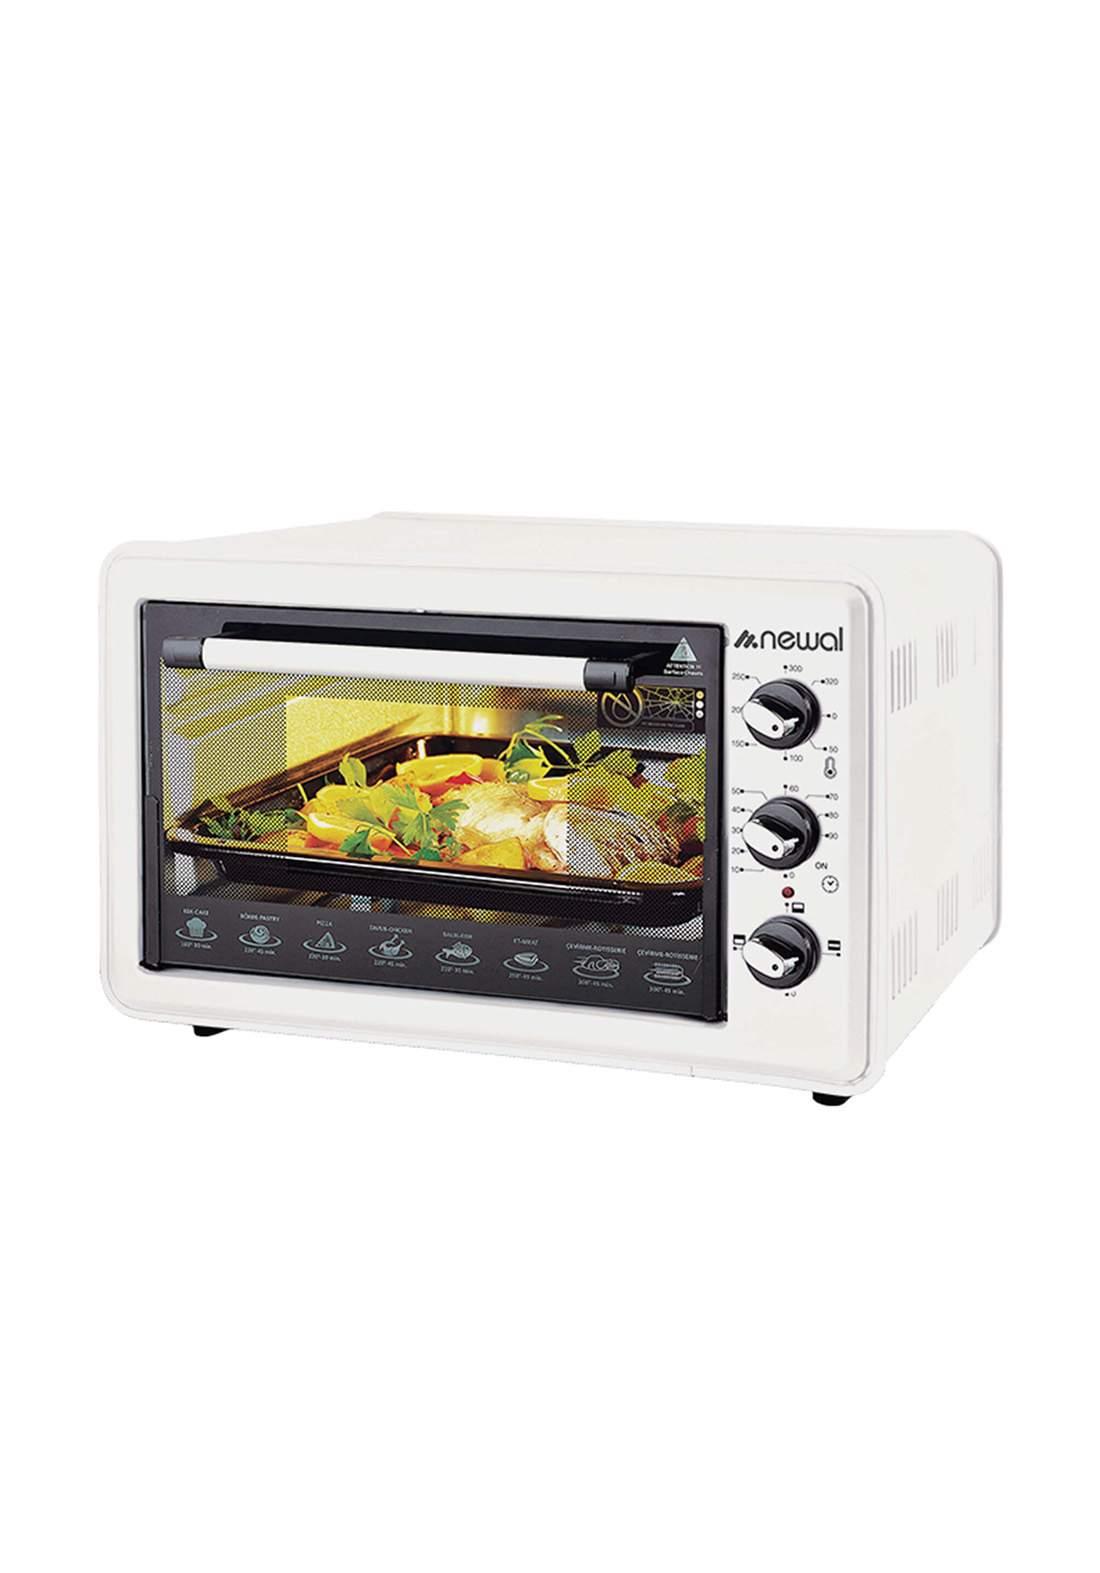 Newal Mini Oven 36L MOV-360-01 - White فرن كهربائي